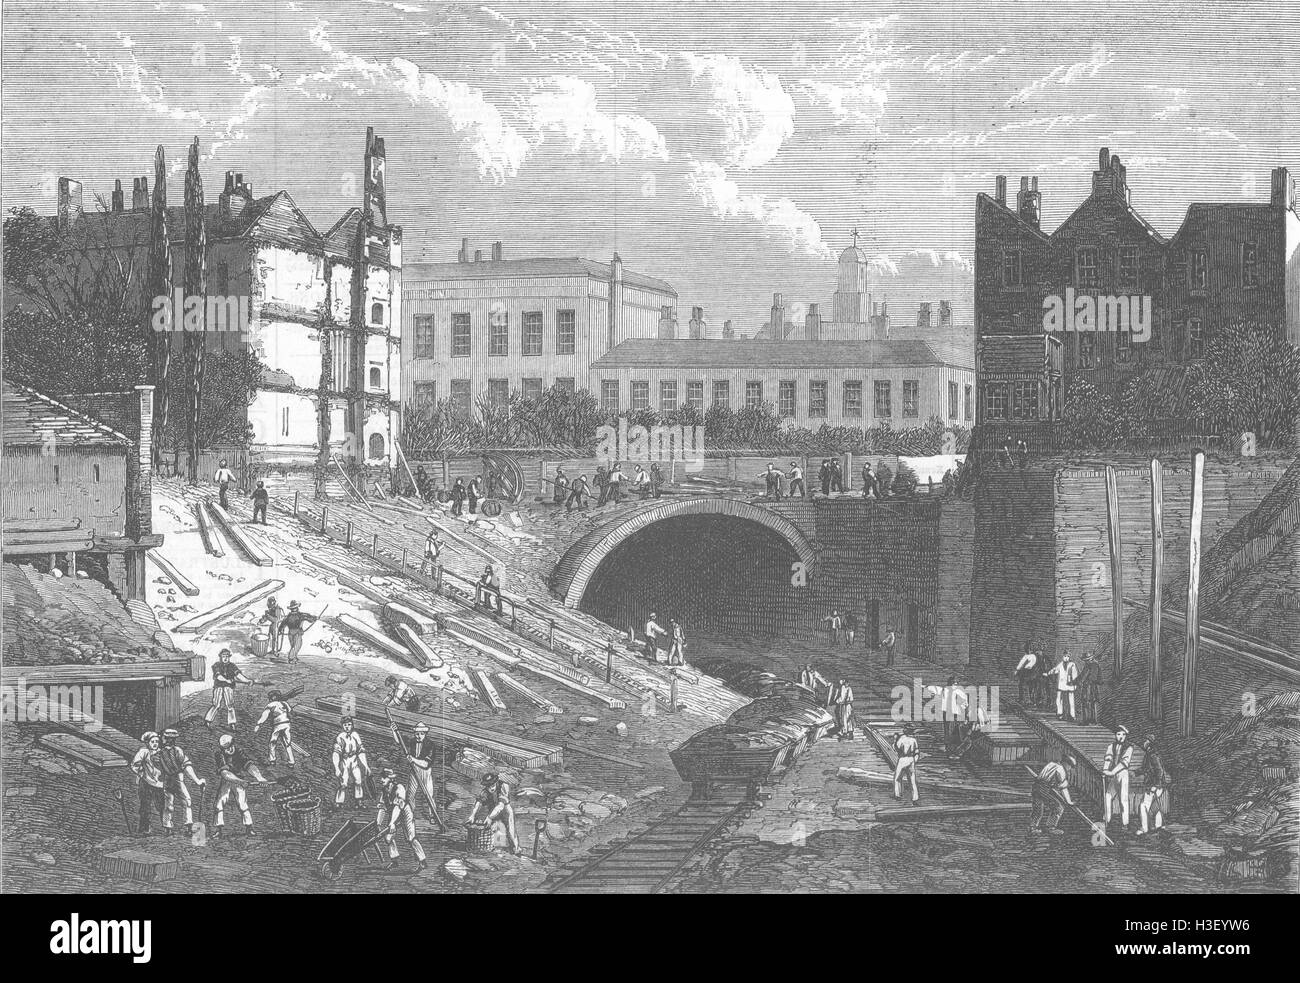 LONDON Underground railway tunnelling at Baker Street 1868. Illustrated London News - Stock Image